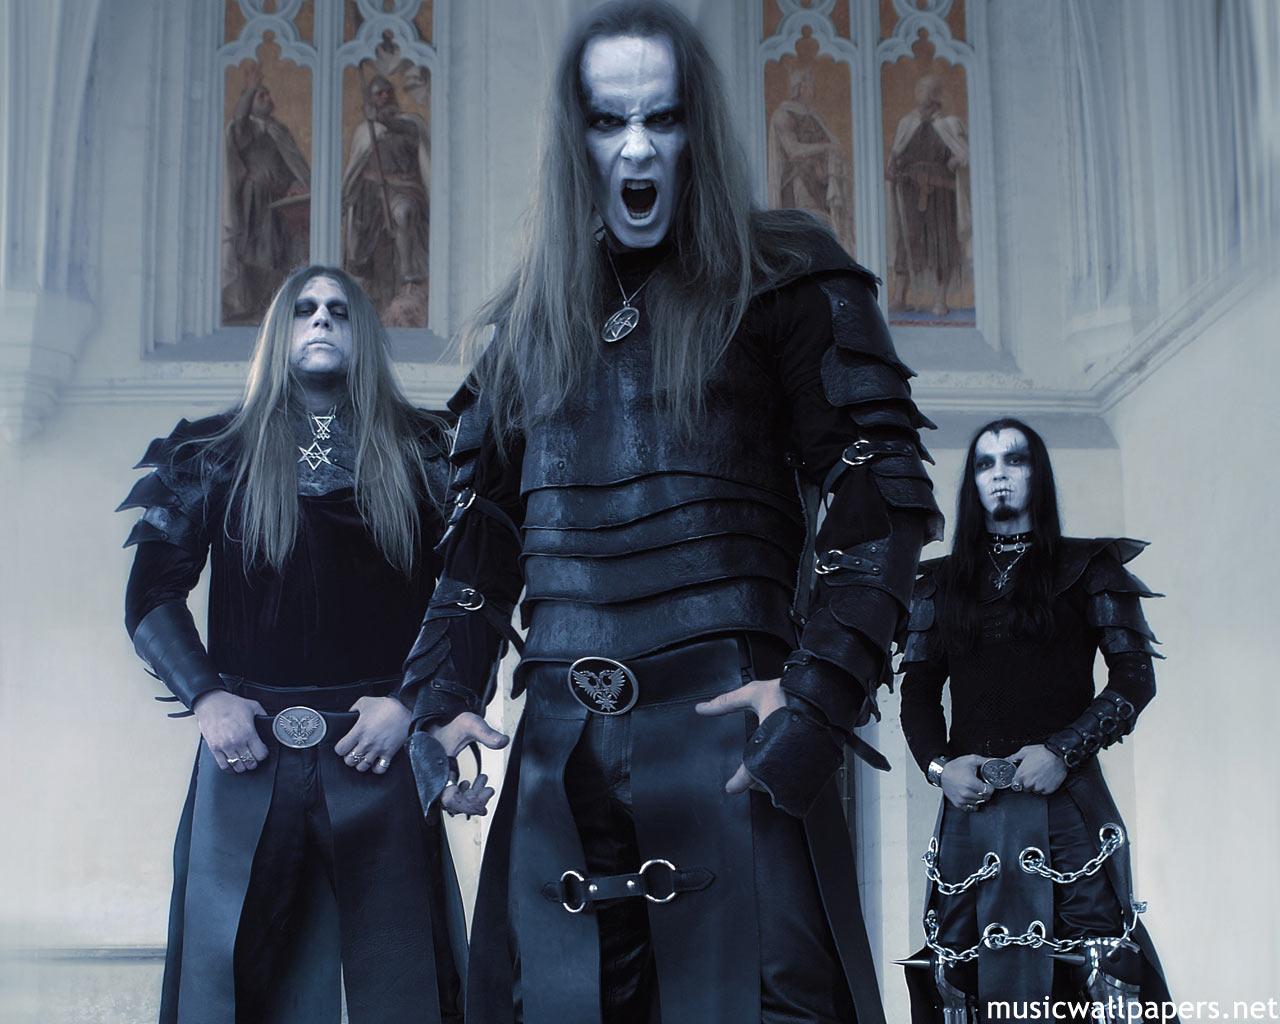 http://3.bp.blogspot.com/-pbO4COuXHco/TYg57mXqcbI/AAAAAAAABgI/MrFcDmXPRLI/s1600/Behemoth_16.jpg